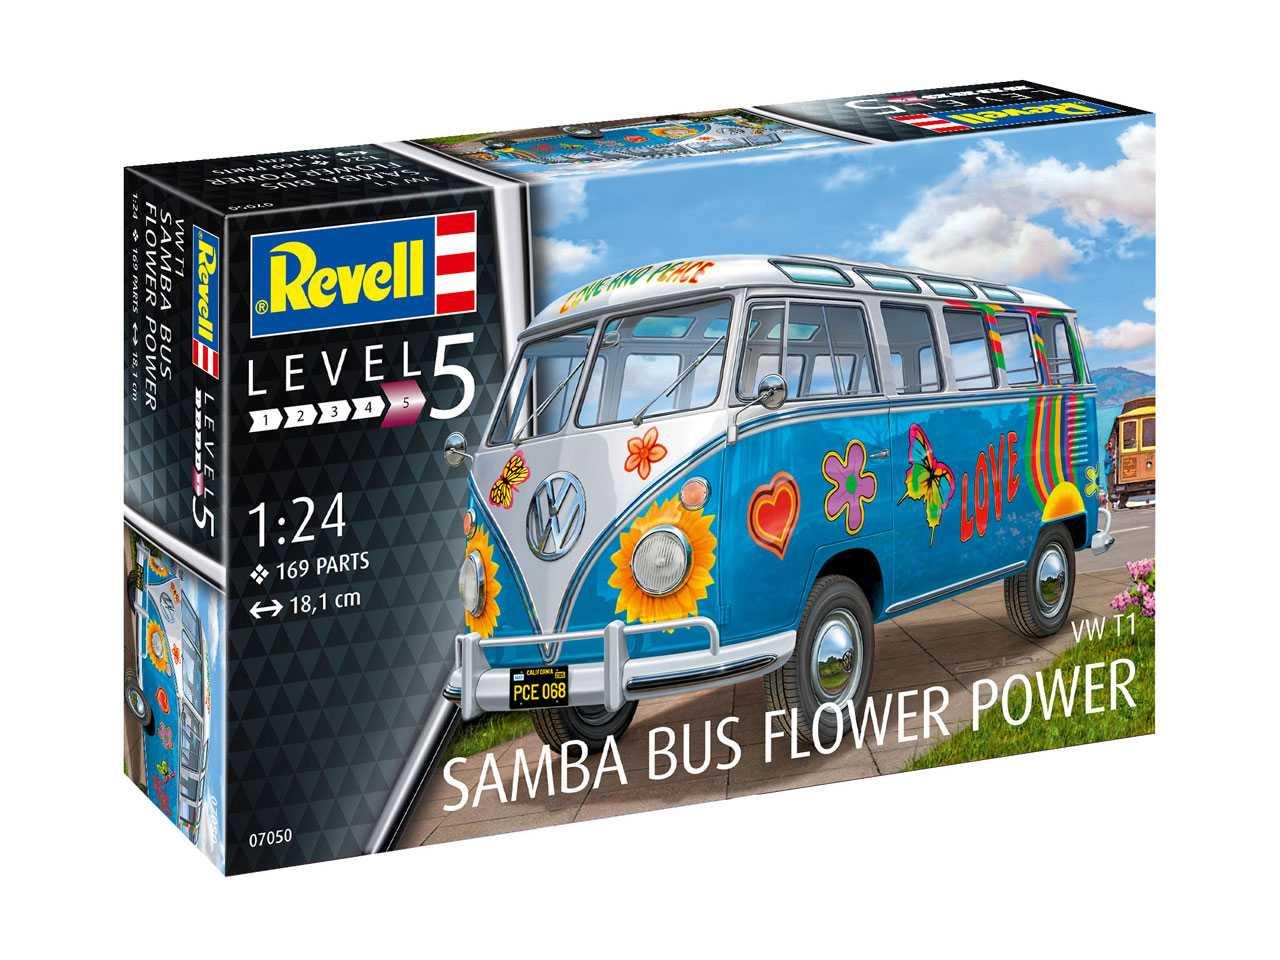 Náhled produktu - 1:24 VW T1 Samba Bus ″Flower Power″